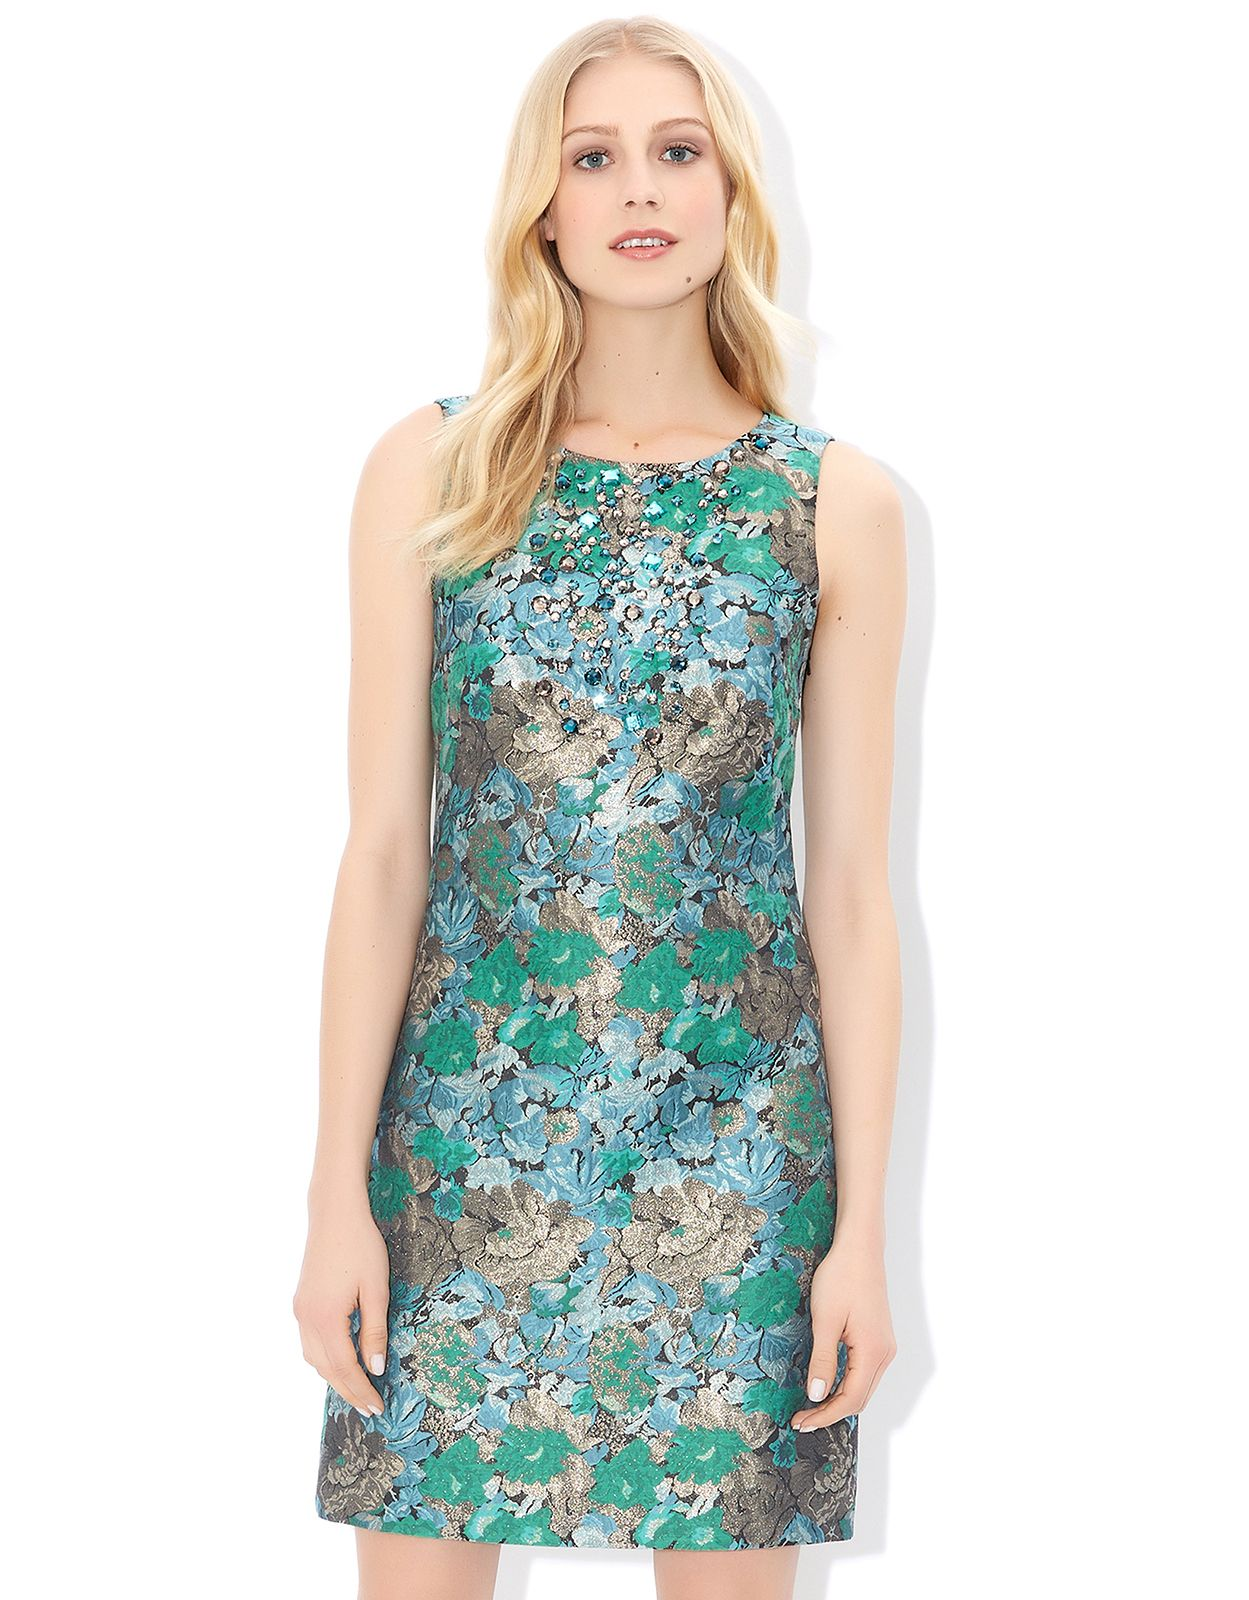 Monsoon Vespa Dress Green 8 | Must see Tops & Dresses - Latest ...